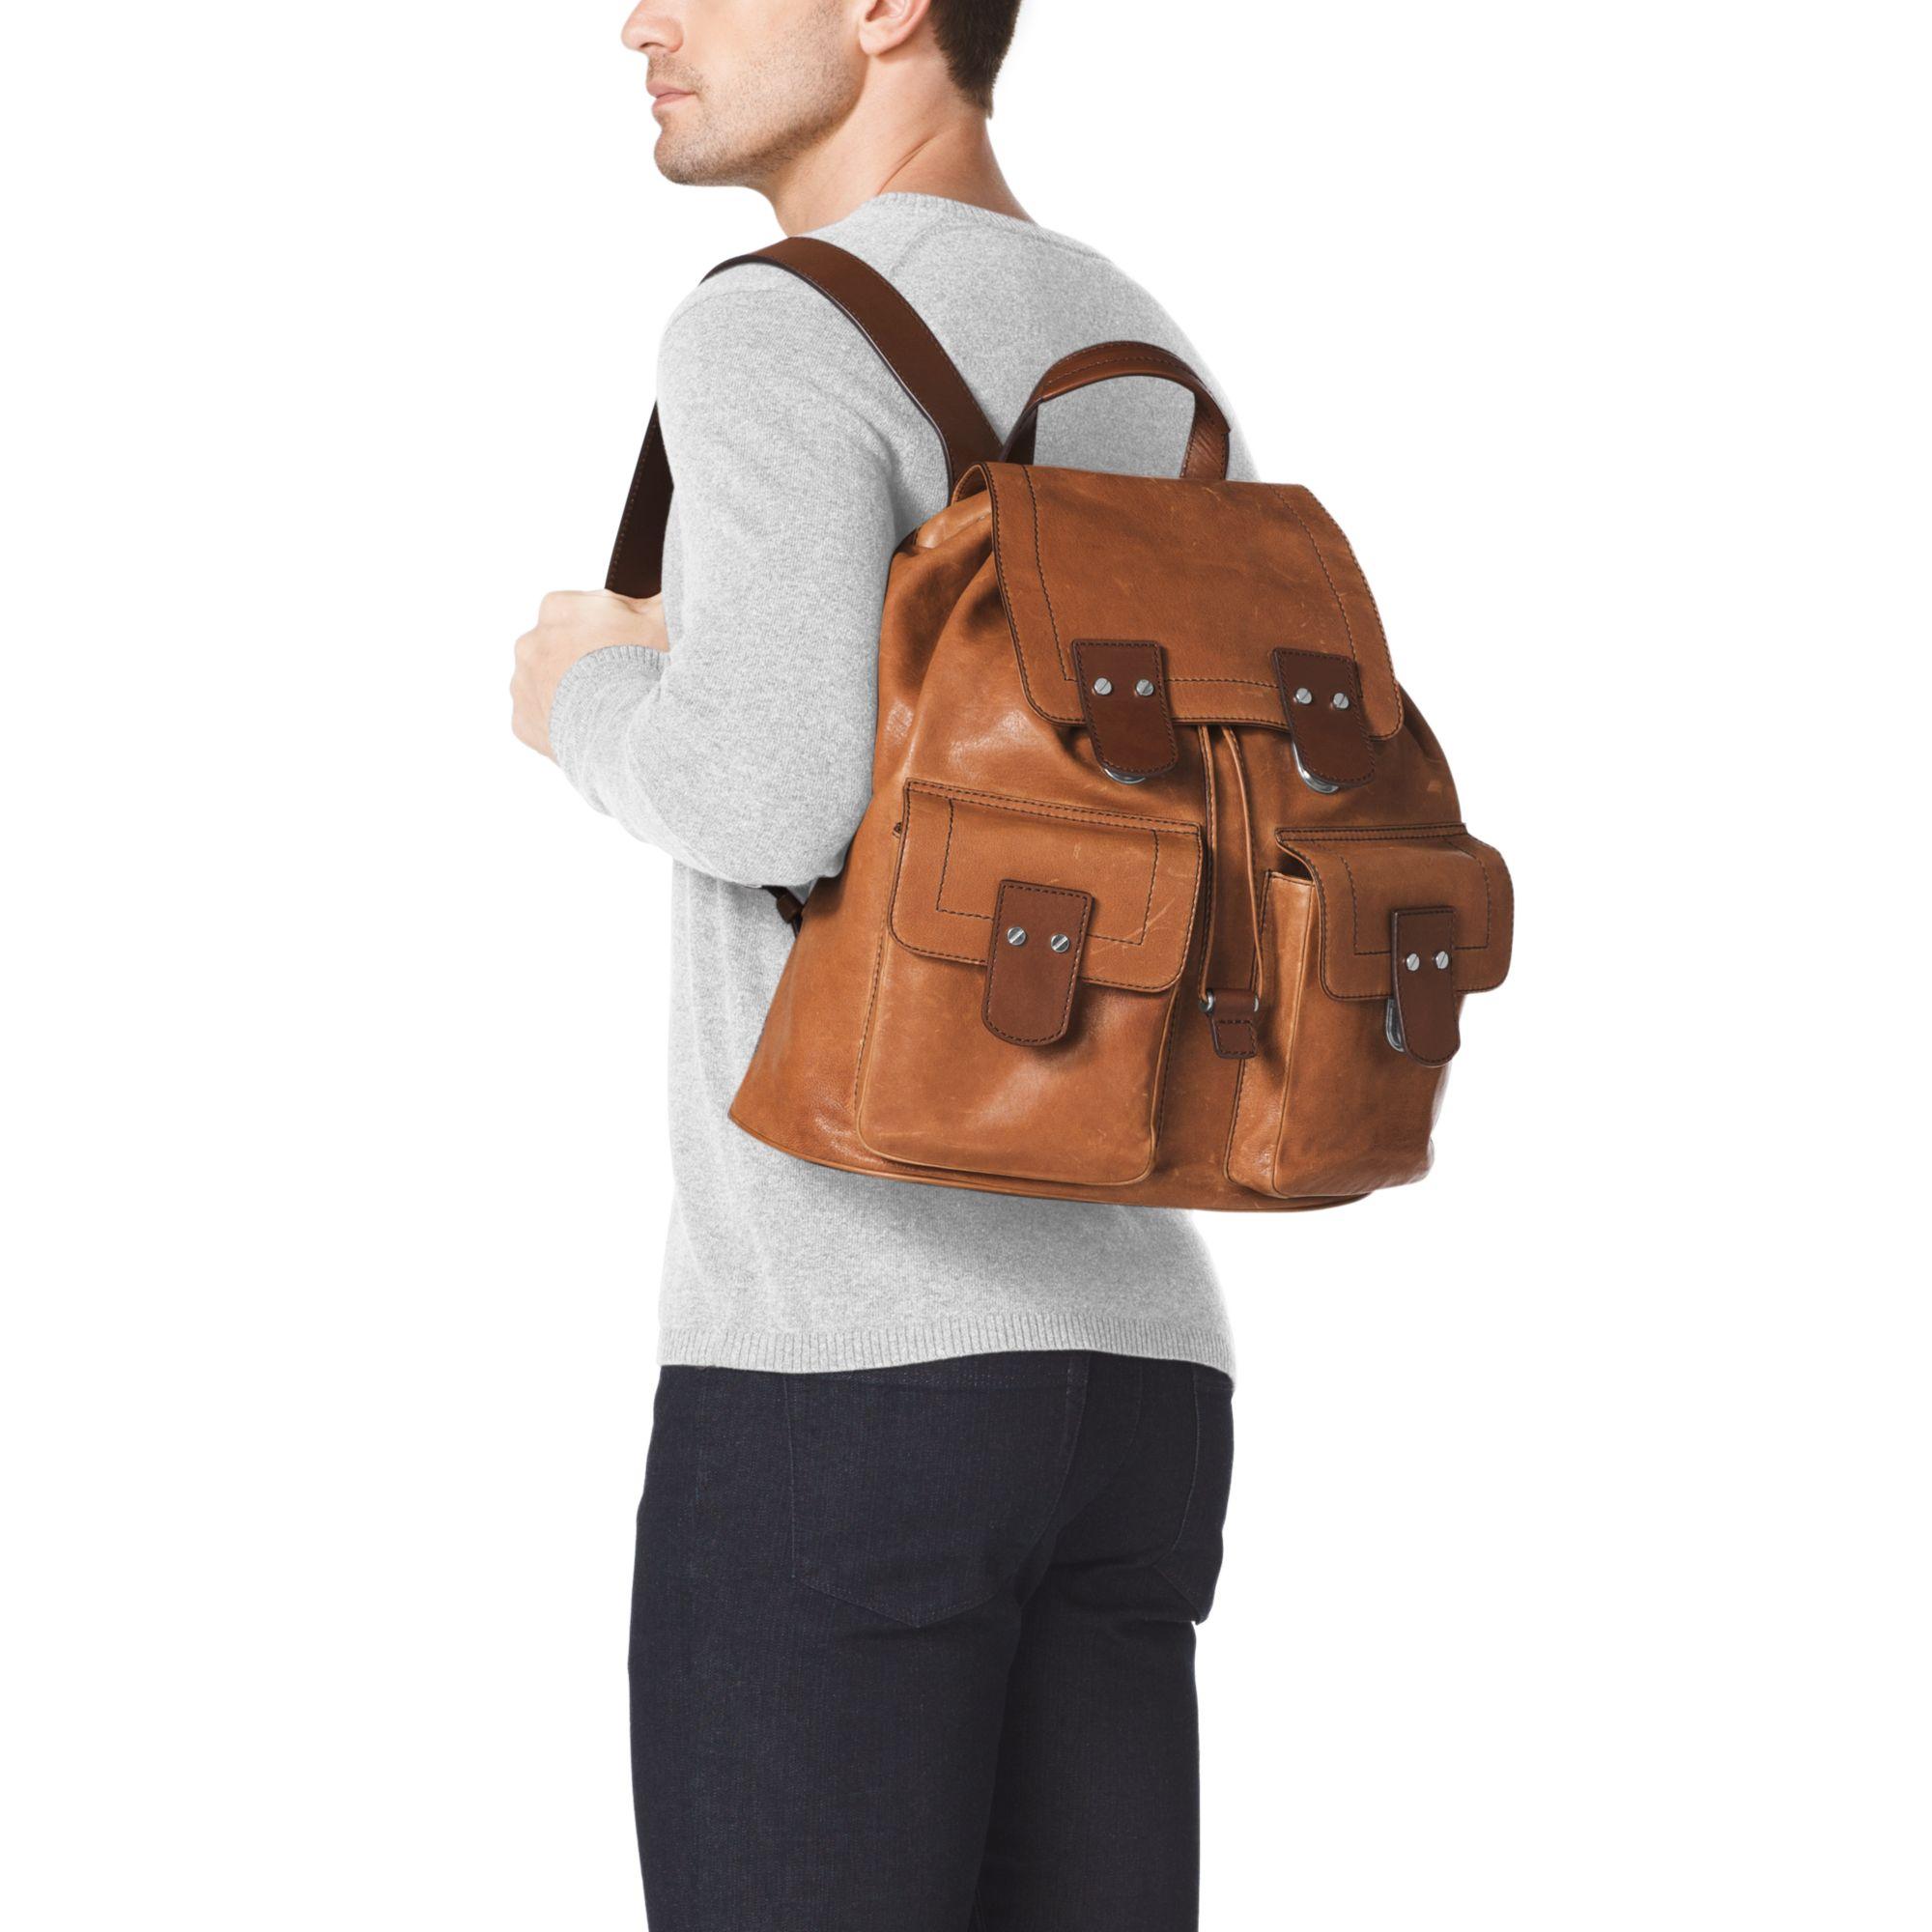 2234ca16ab04 order michael kors mens bryant leather backpack 187fe 58884  wholesale lyst  michael kors wilder vintage leather backpack in brown for men 86772 ad34c